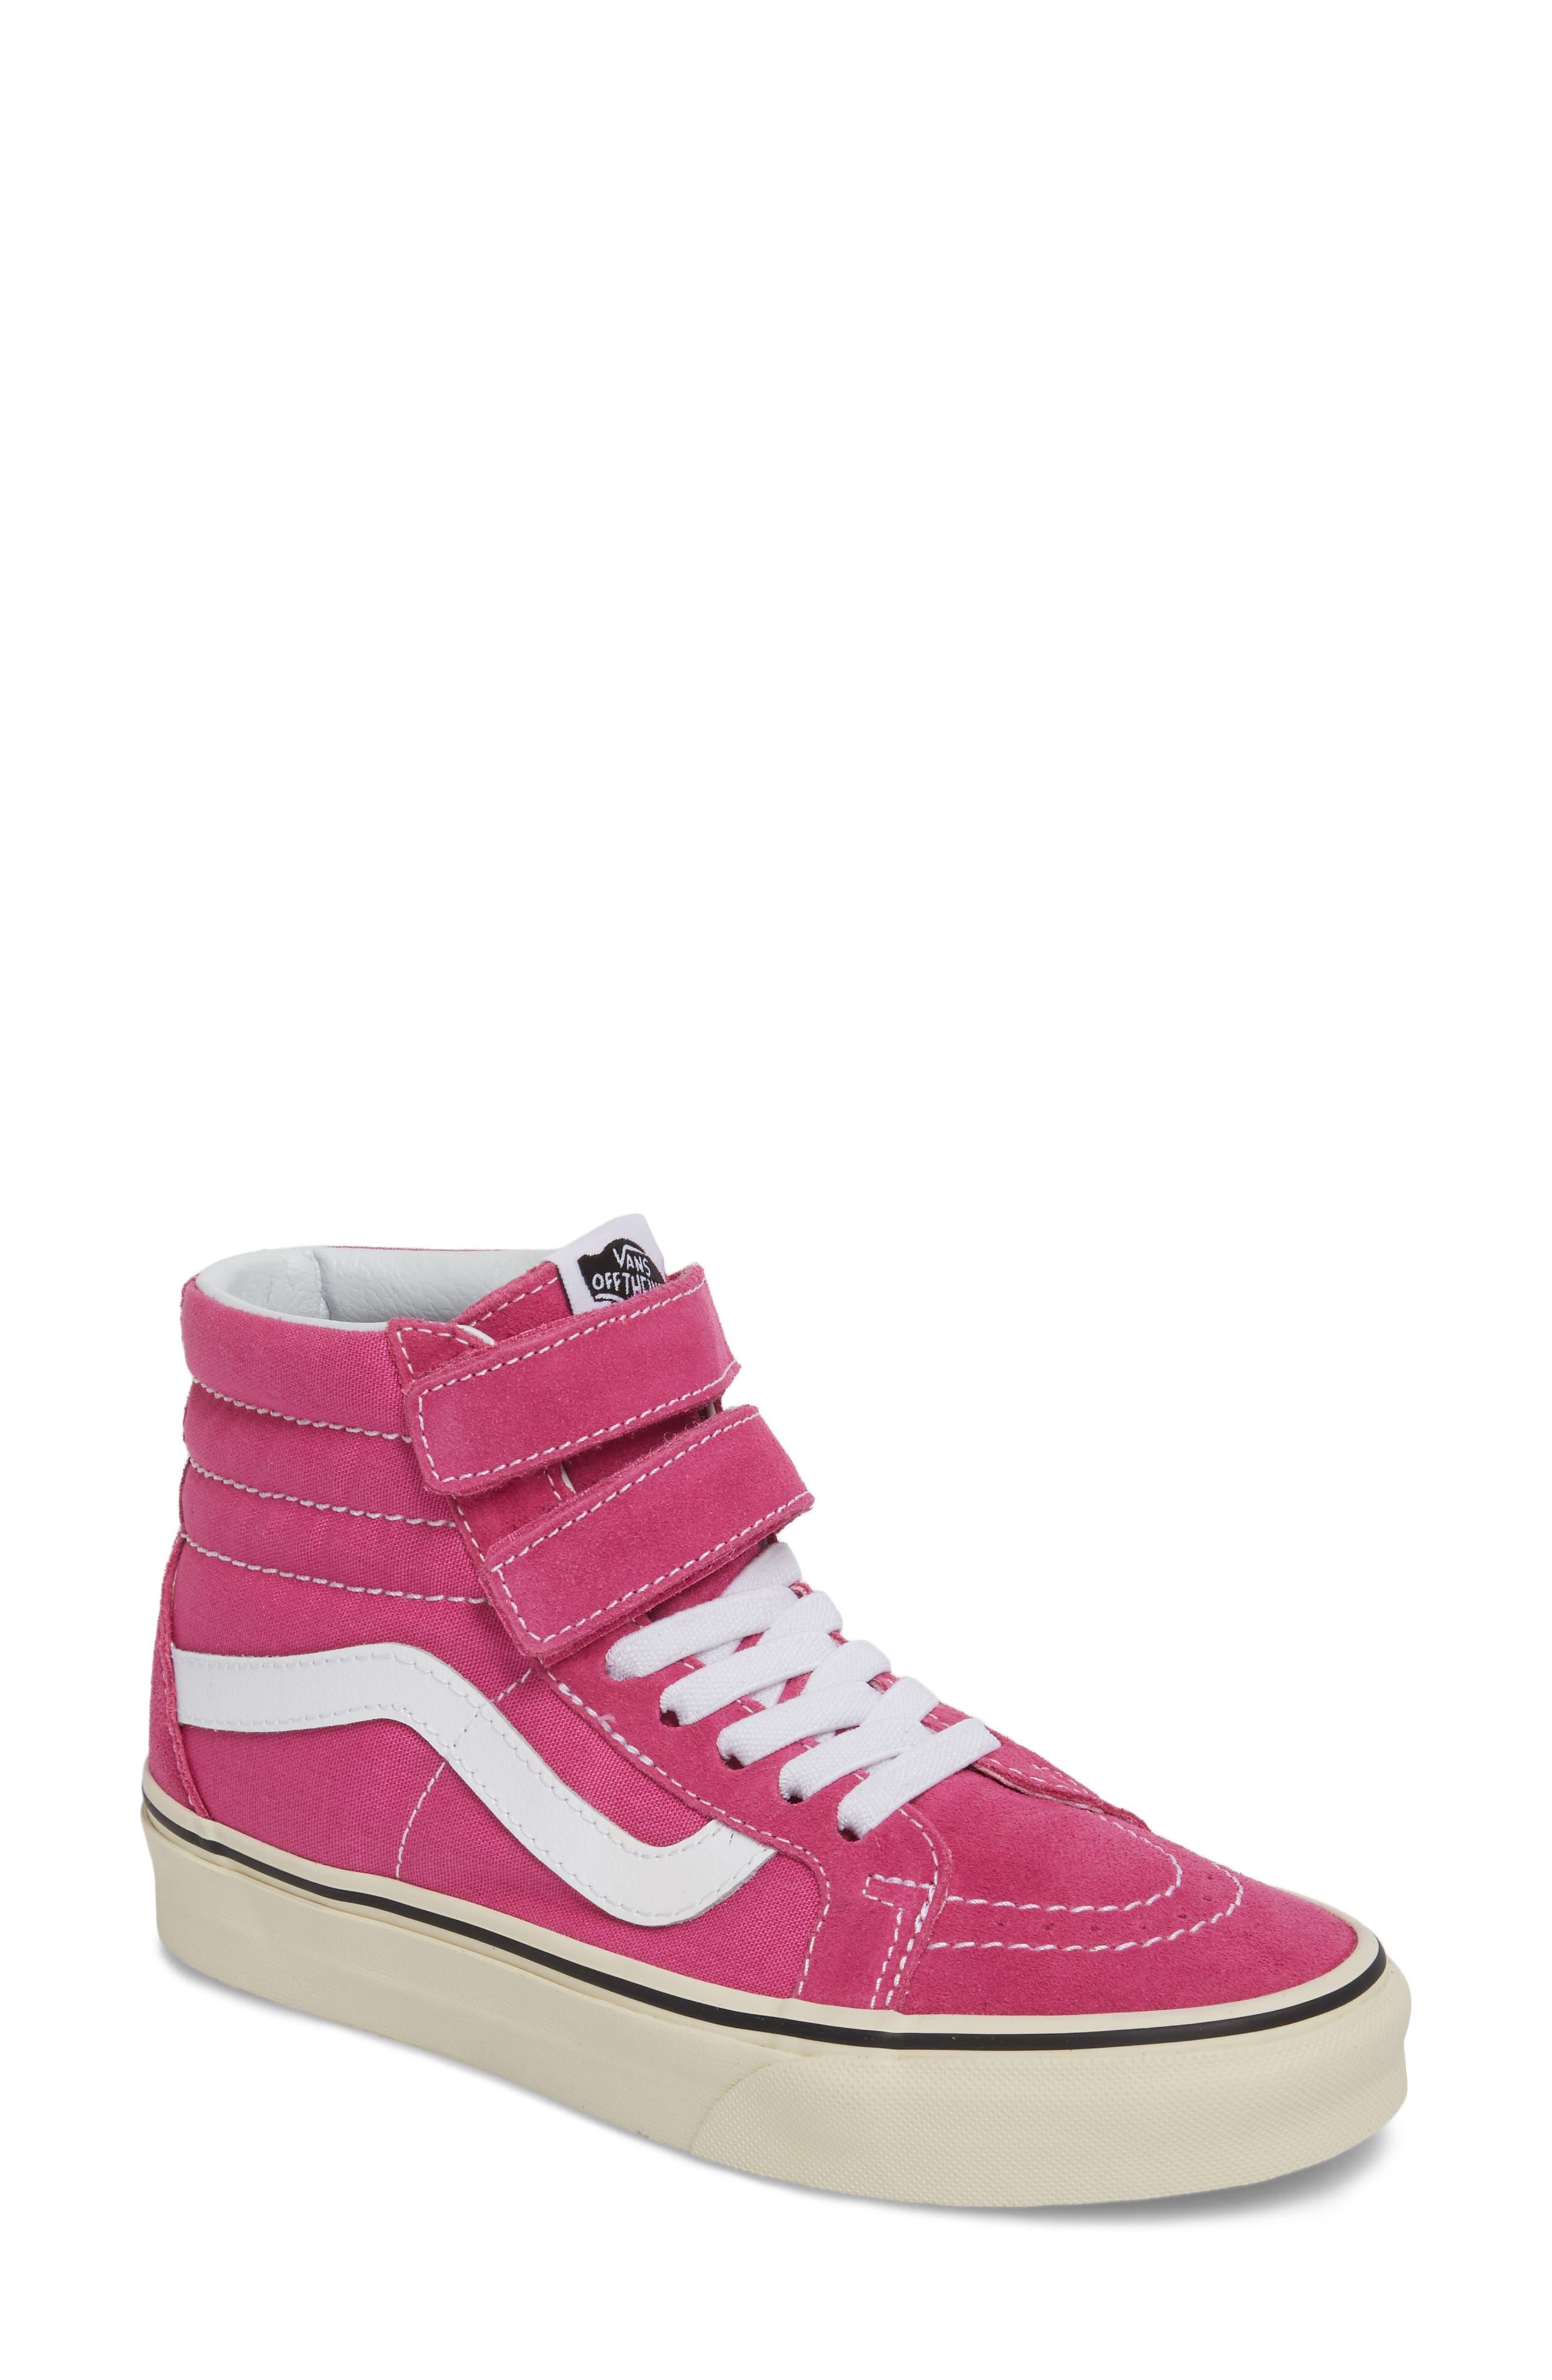 Sk8-Hi Reissue Sneaker,                             Main thumbnail 1, color,                             Raspberry Rose/ Turtledove